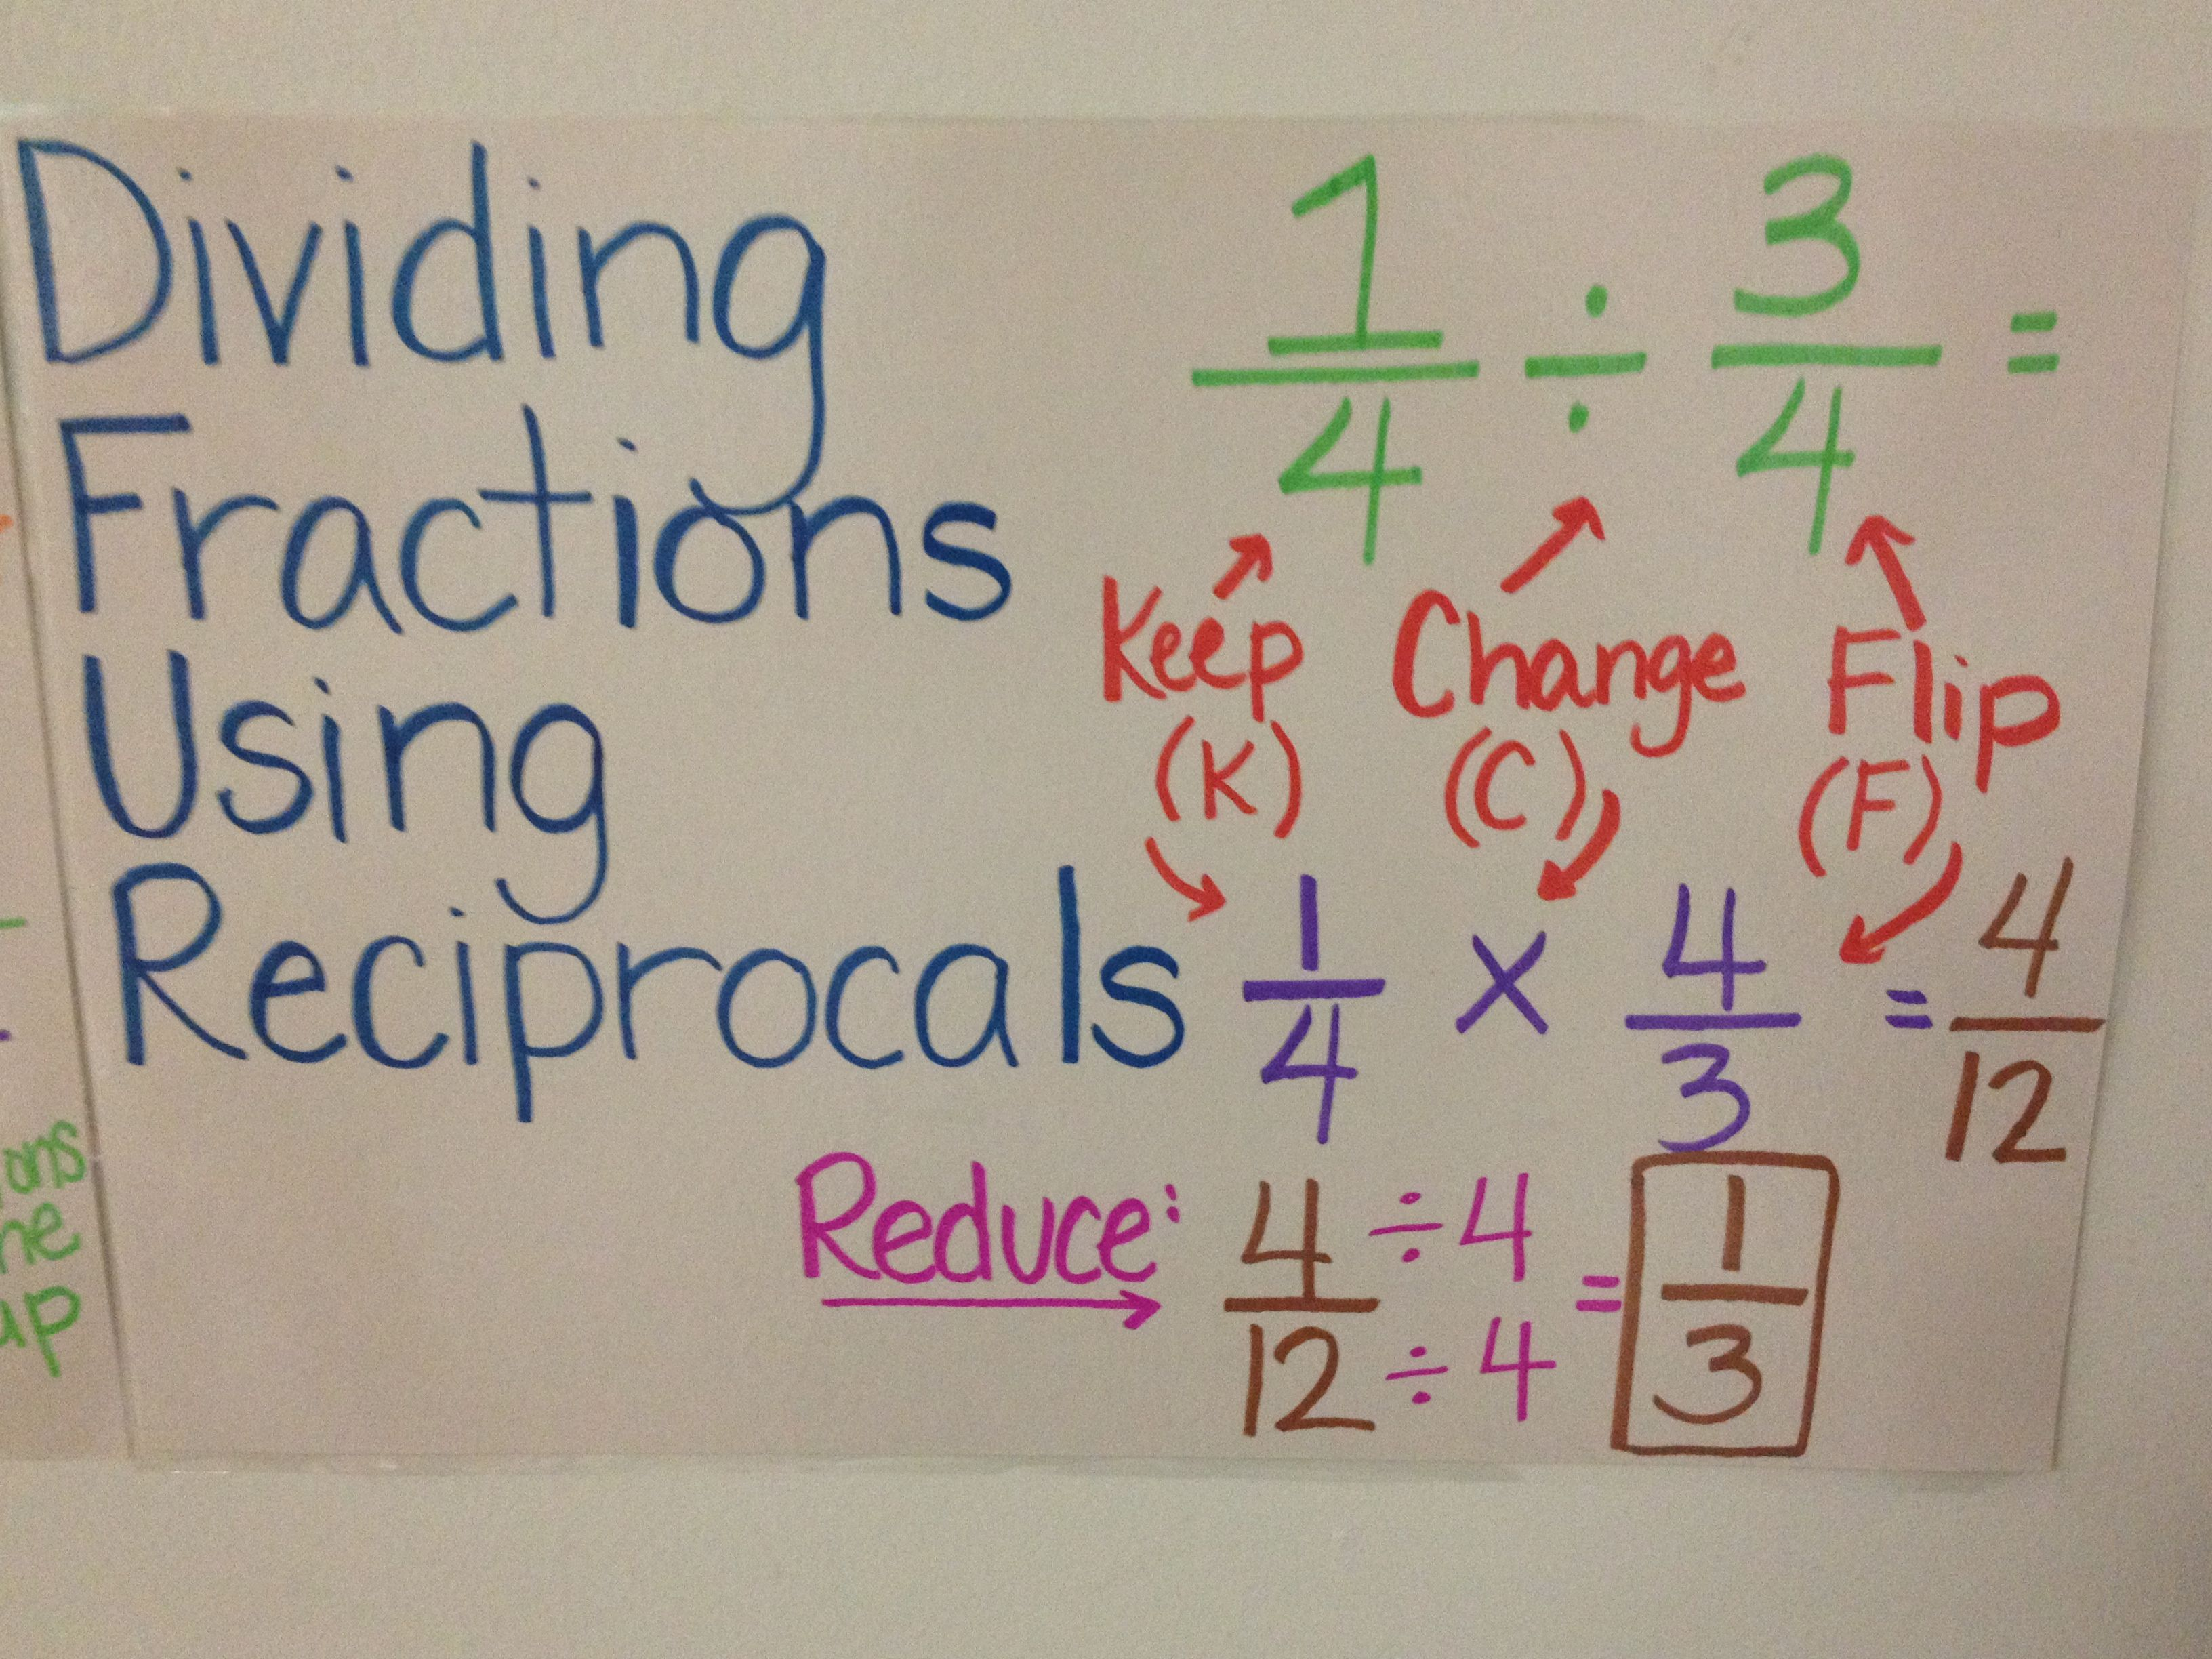 Dividing Fractions Using Reciprocals